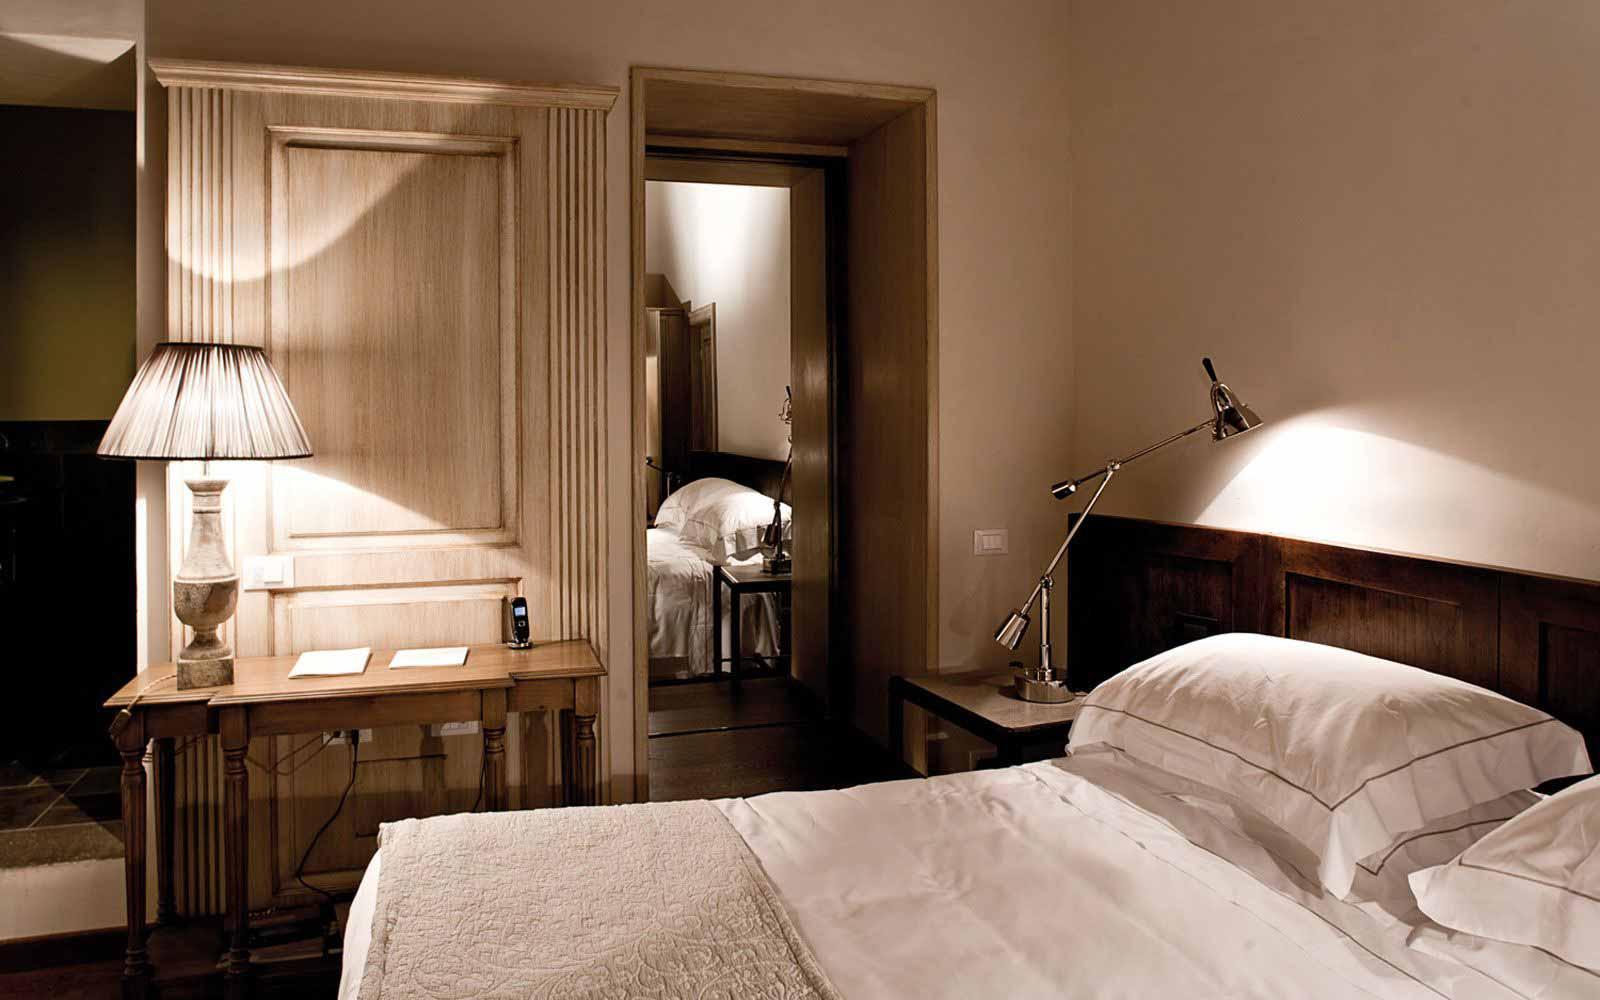 Superior room at Castel Monastero Tuscan Resort & Spa